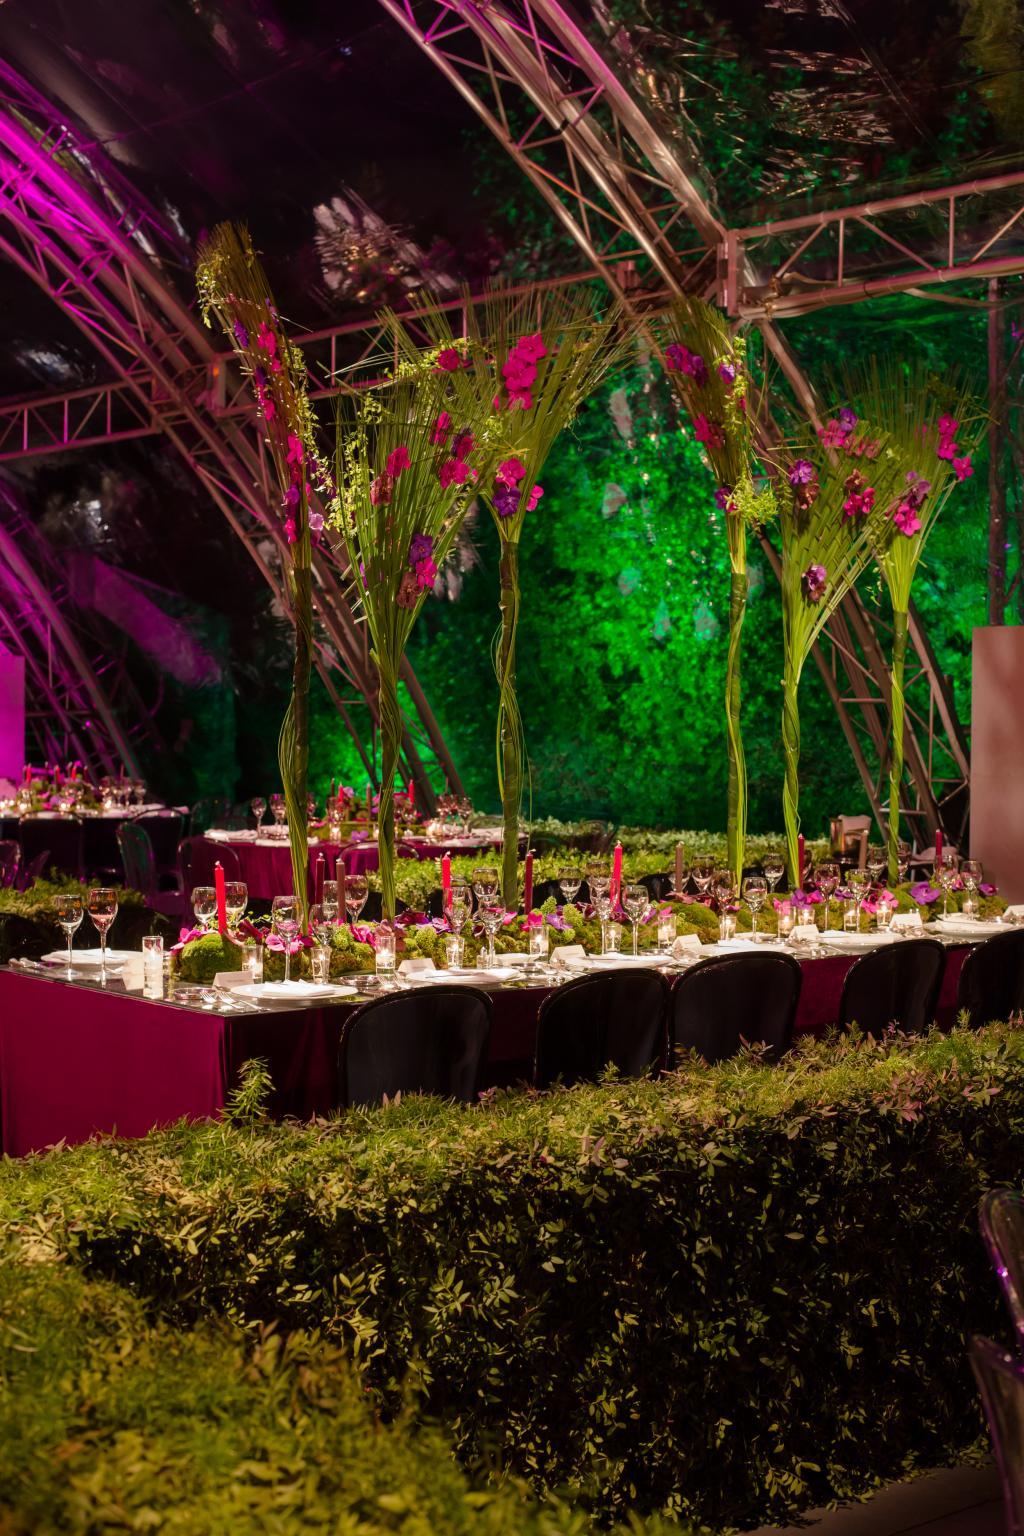 D&G Athens wedding - Image 21